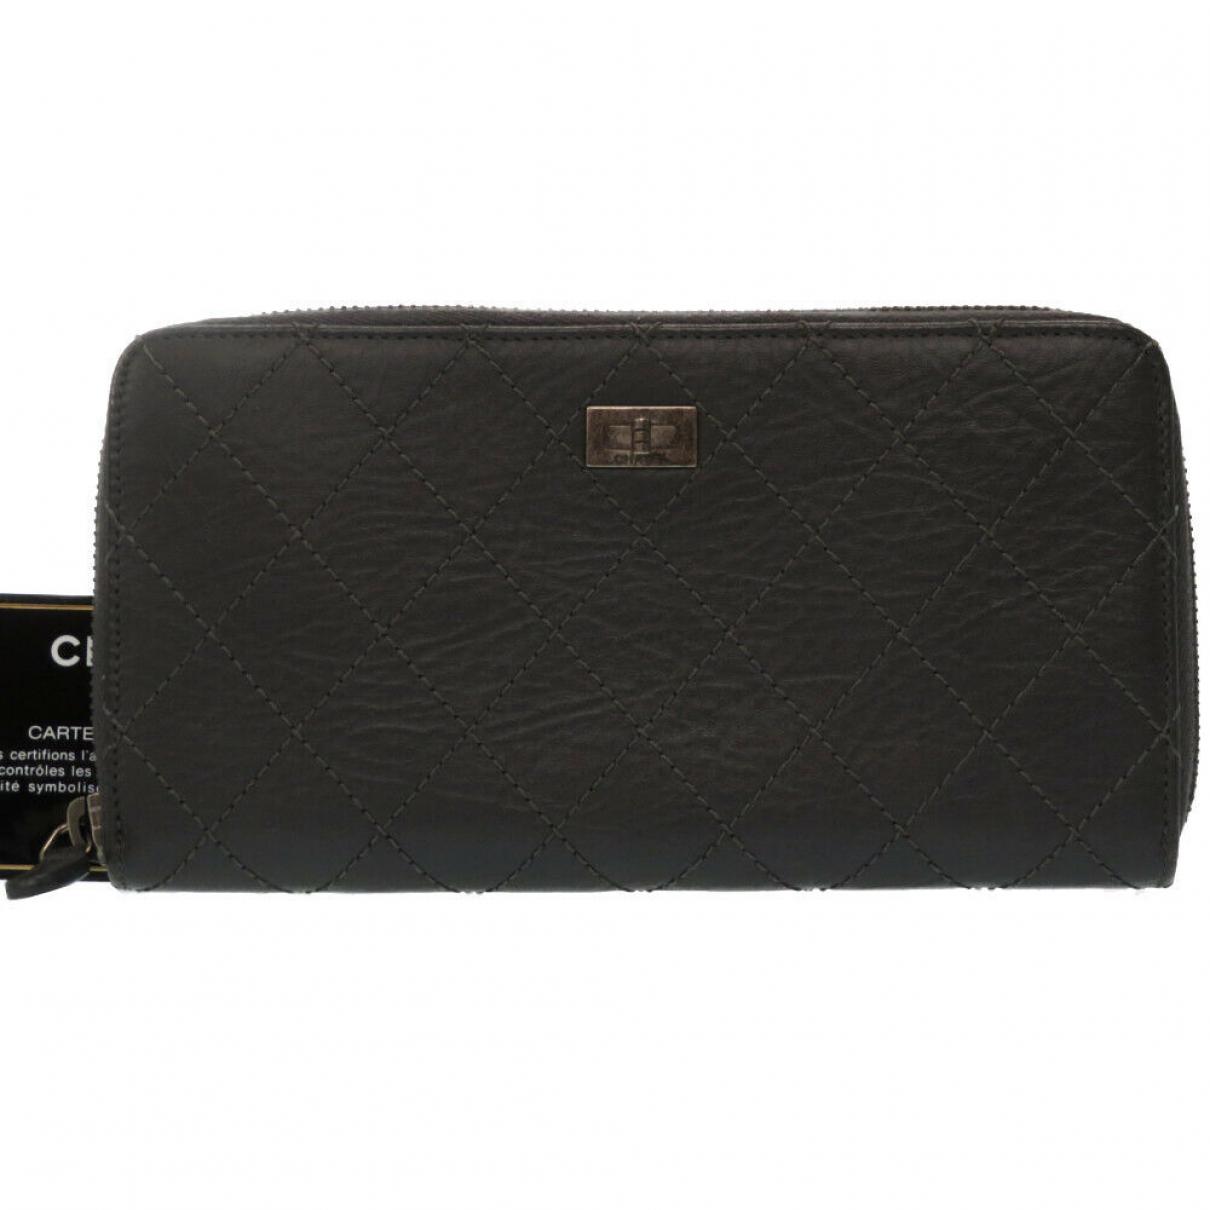 Chanel \N Portemonnaie in  Grau Leder